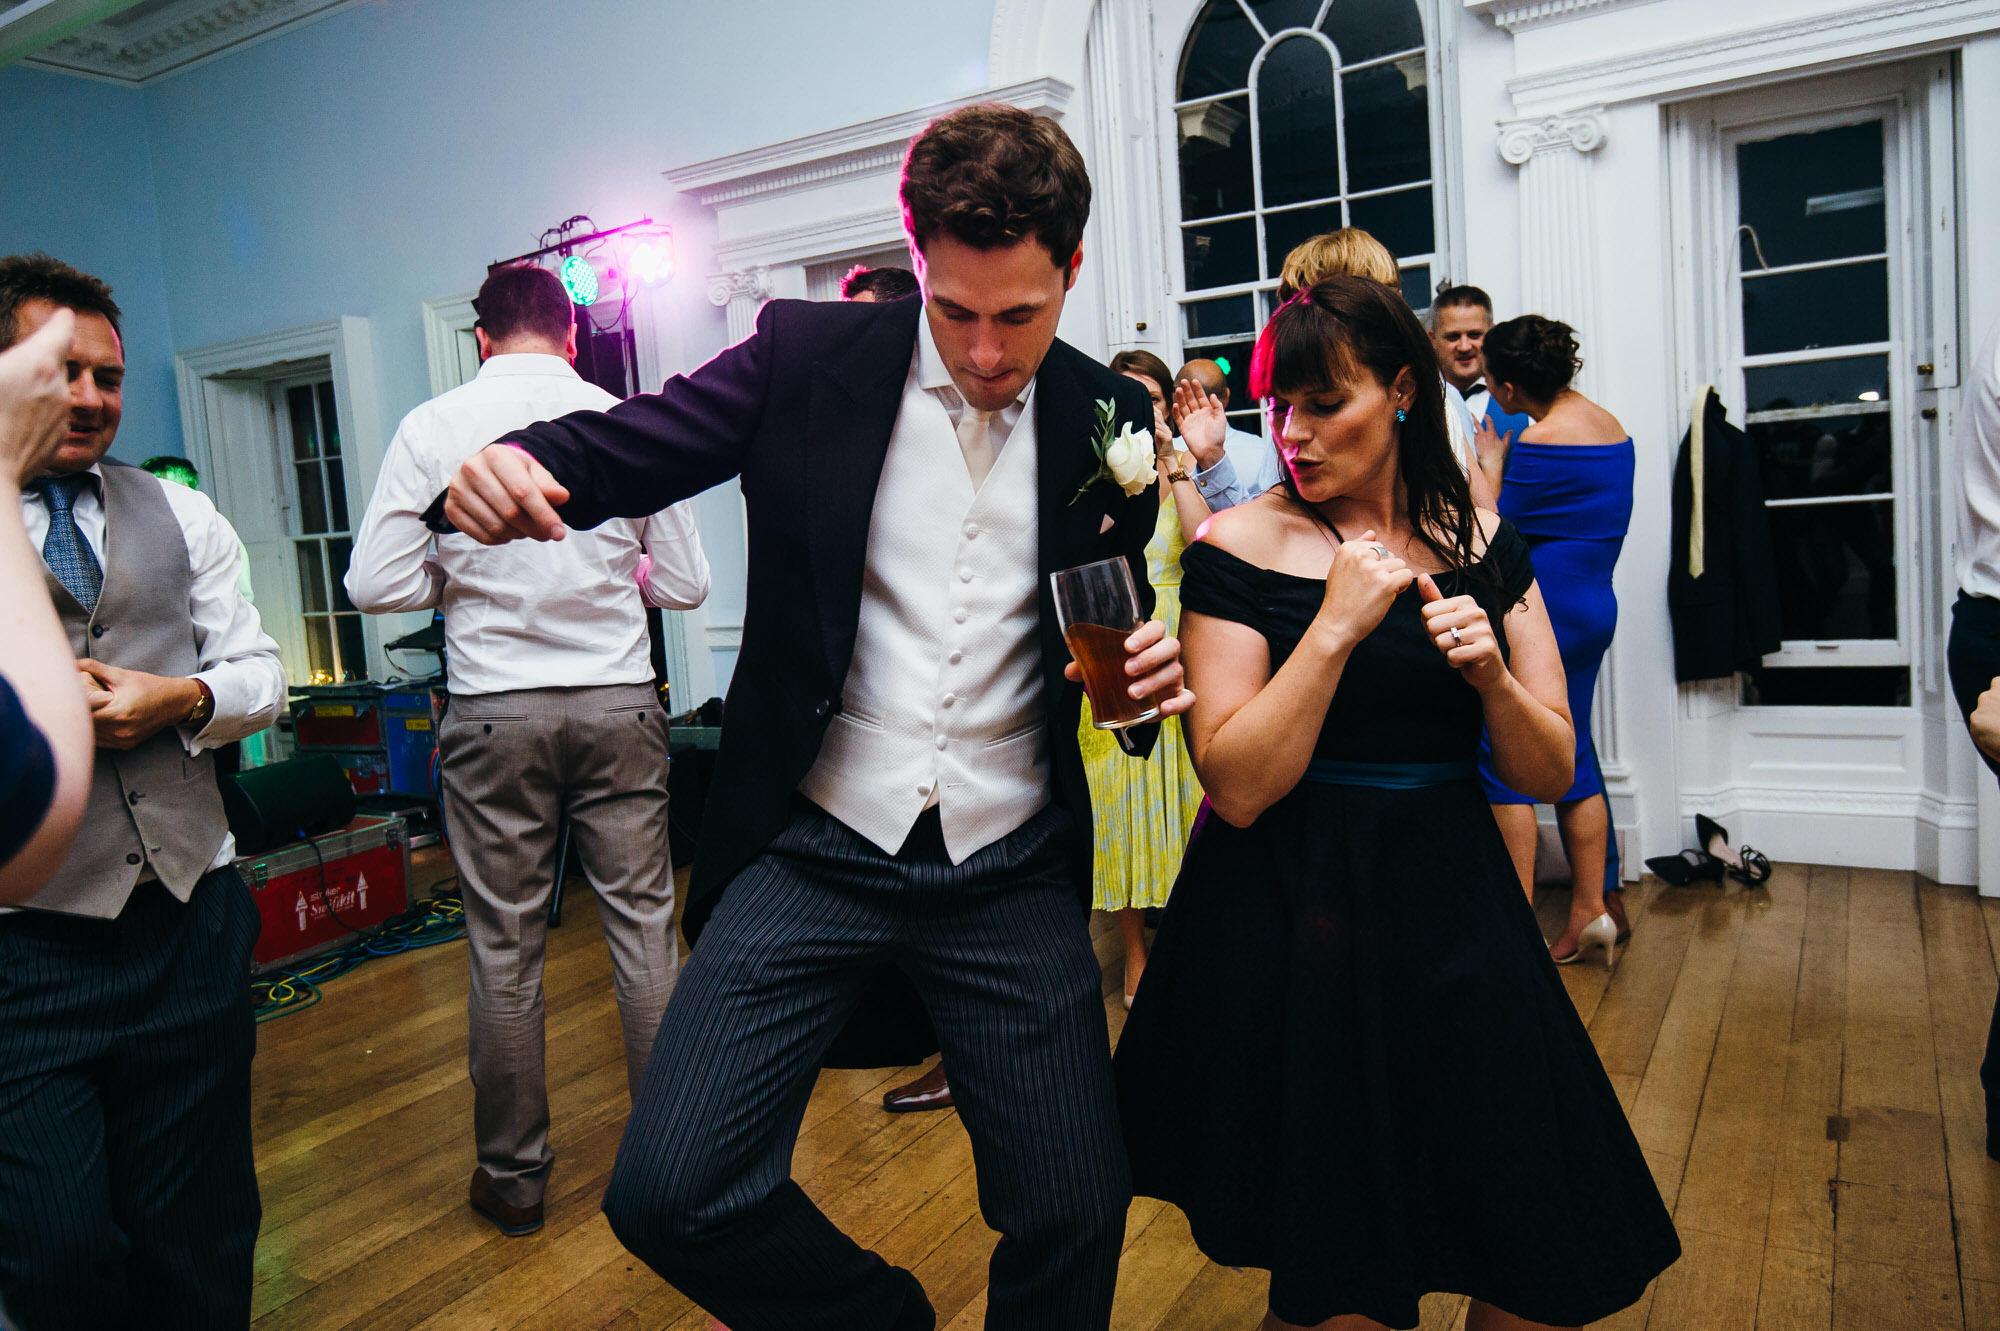 Kingswood school wedding dancing